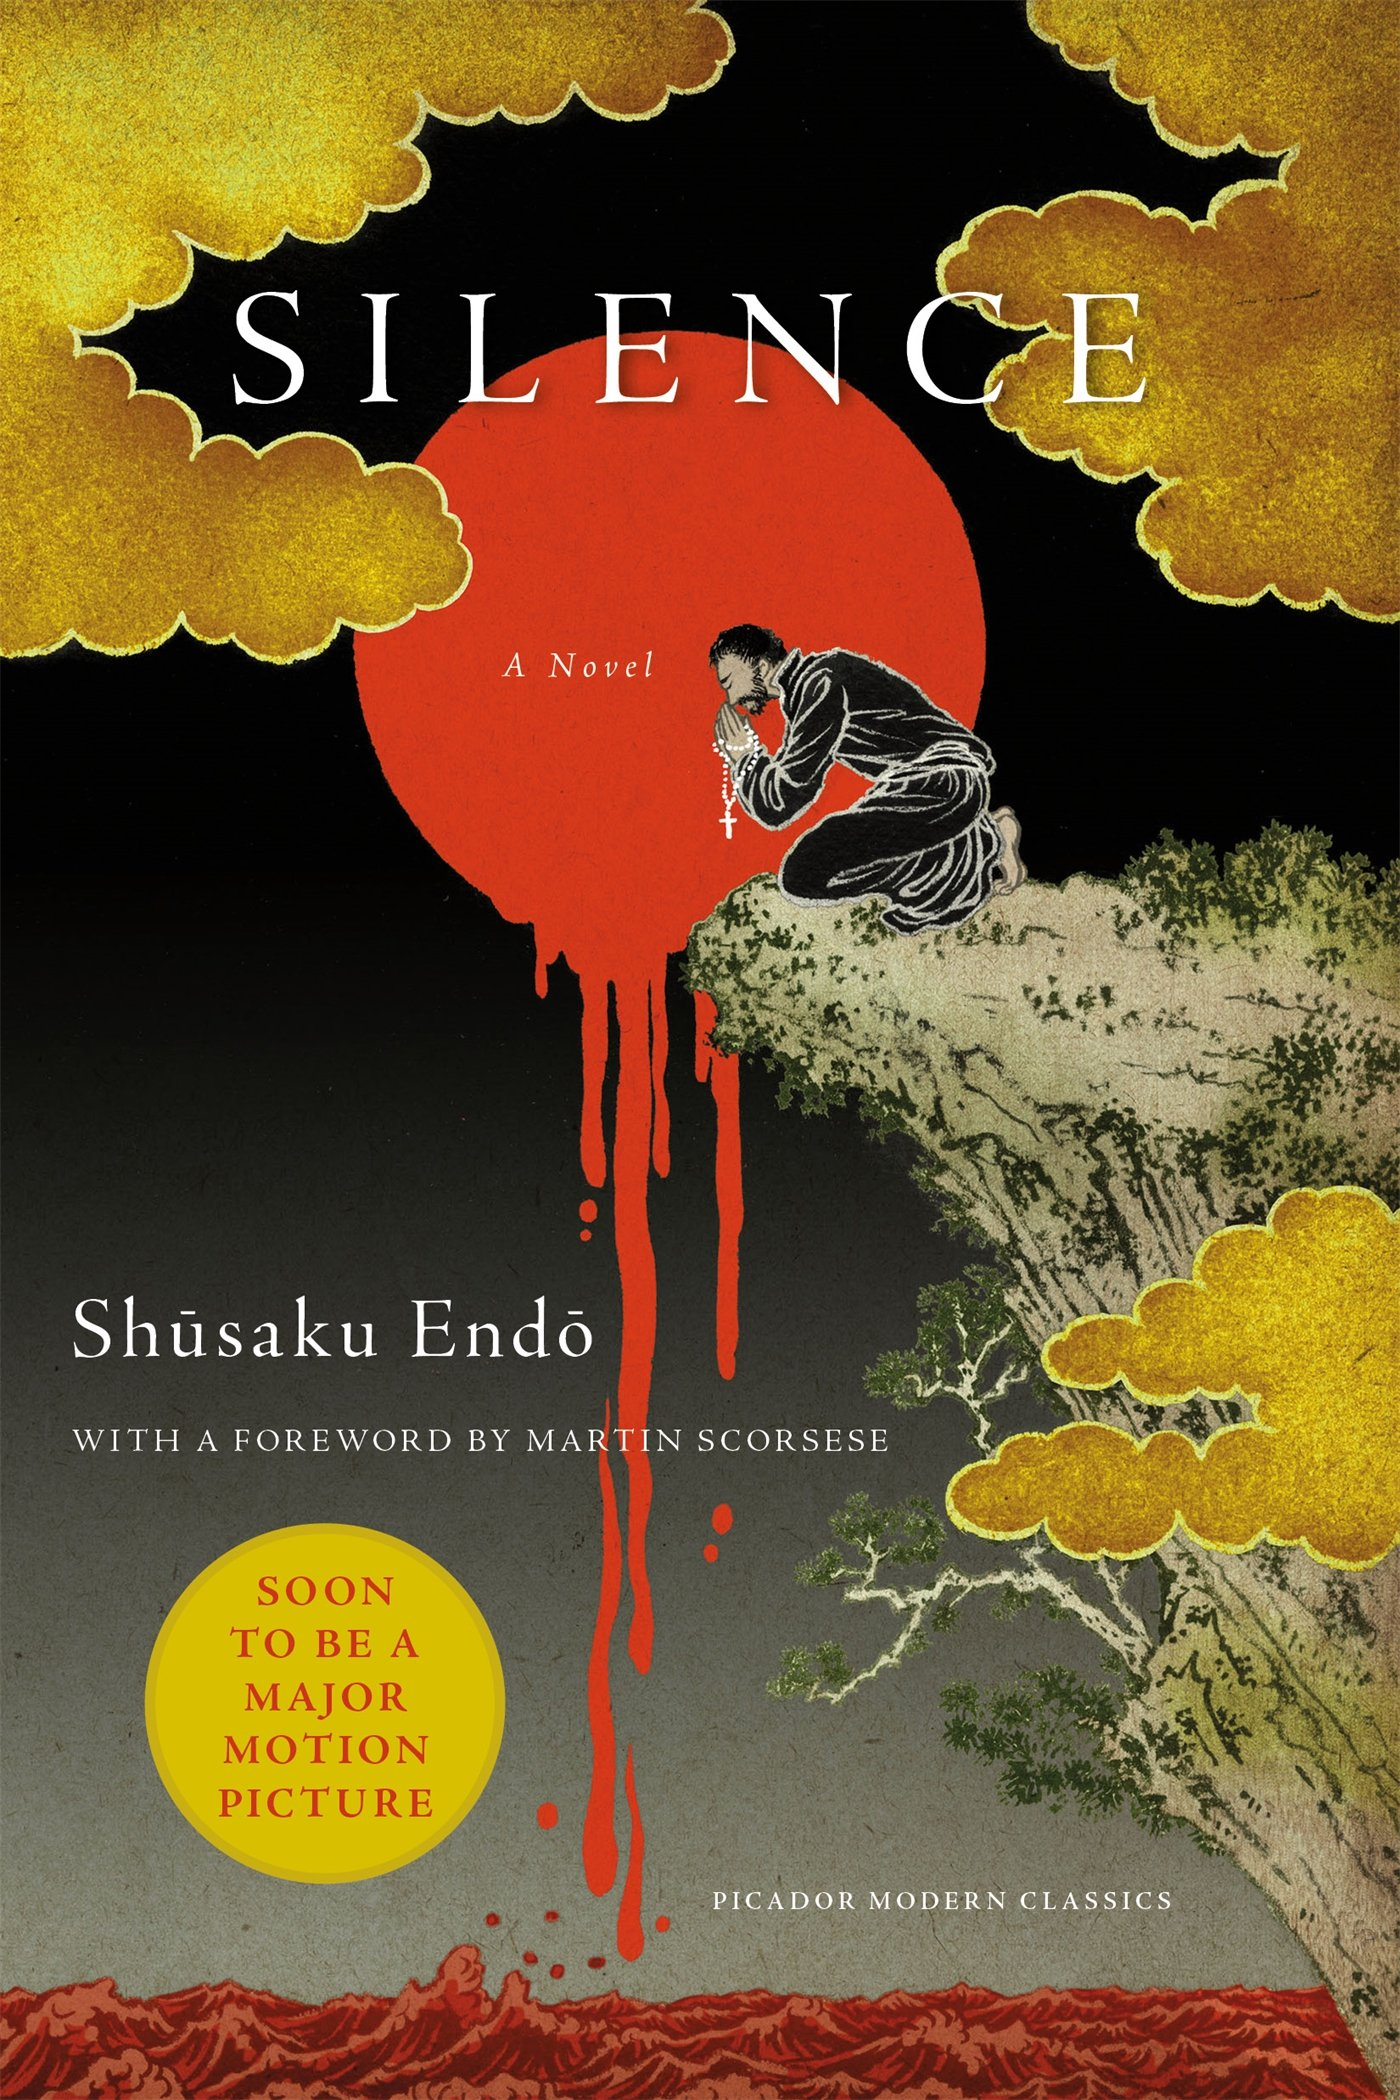 Shusaku Endo's novel Silence